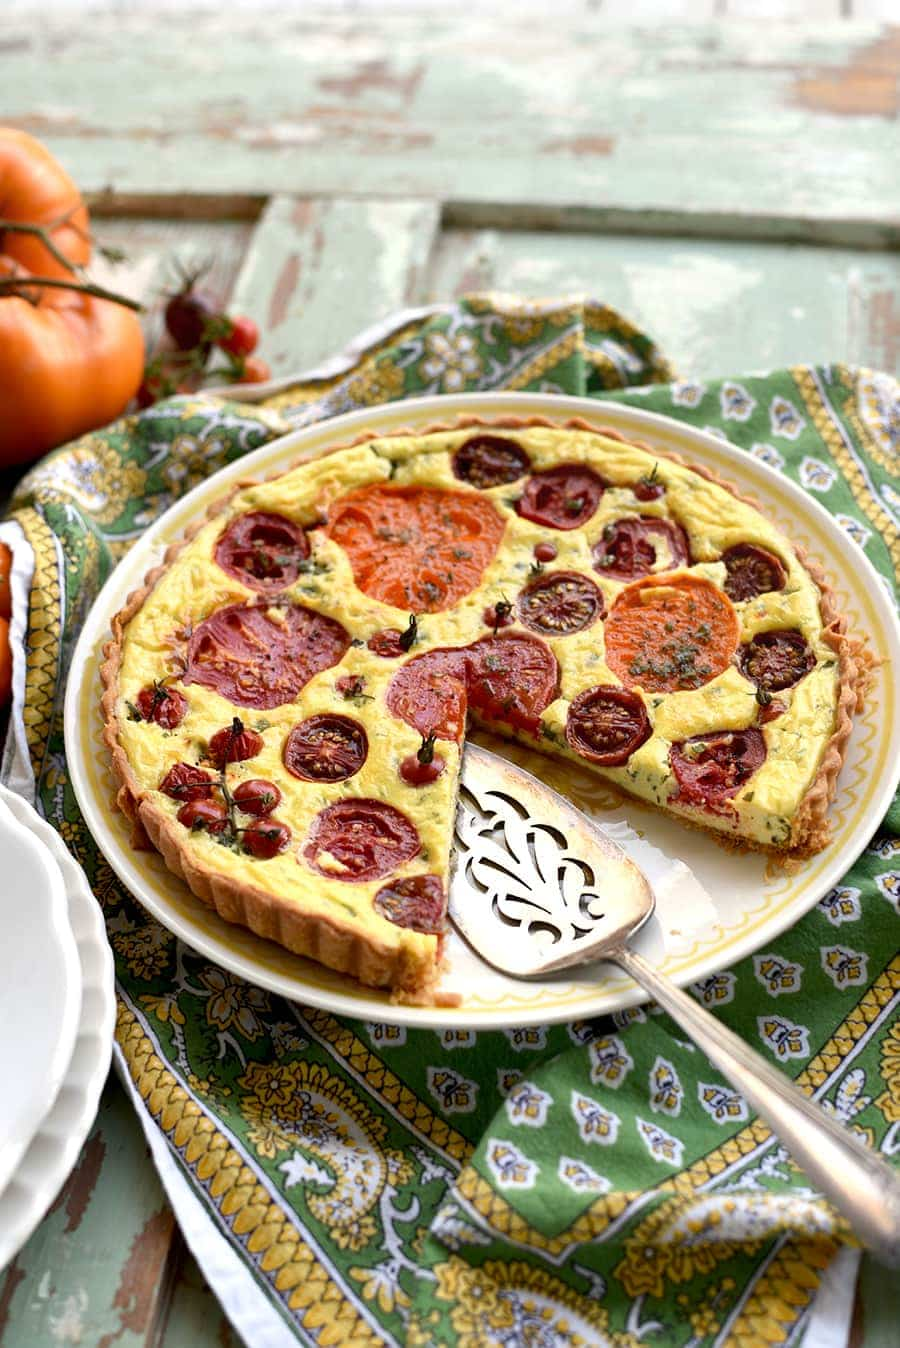 tomato tart missing a slice